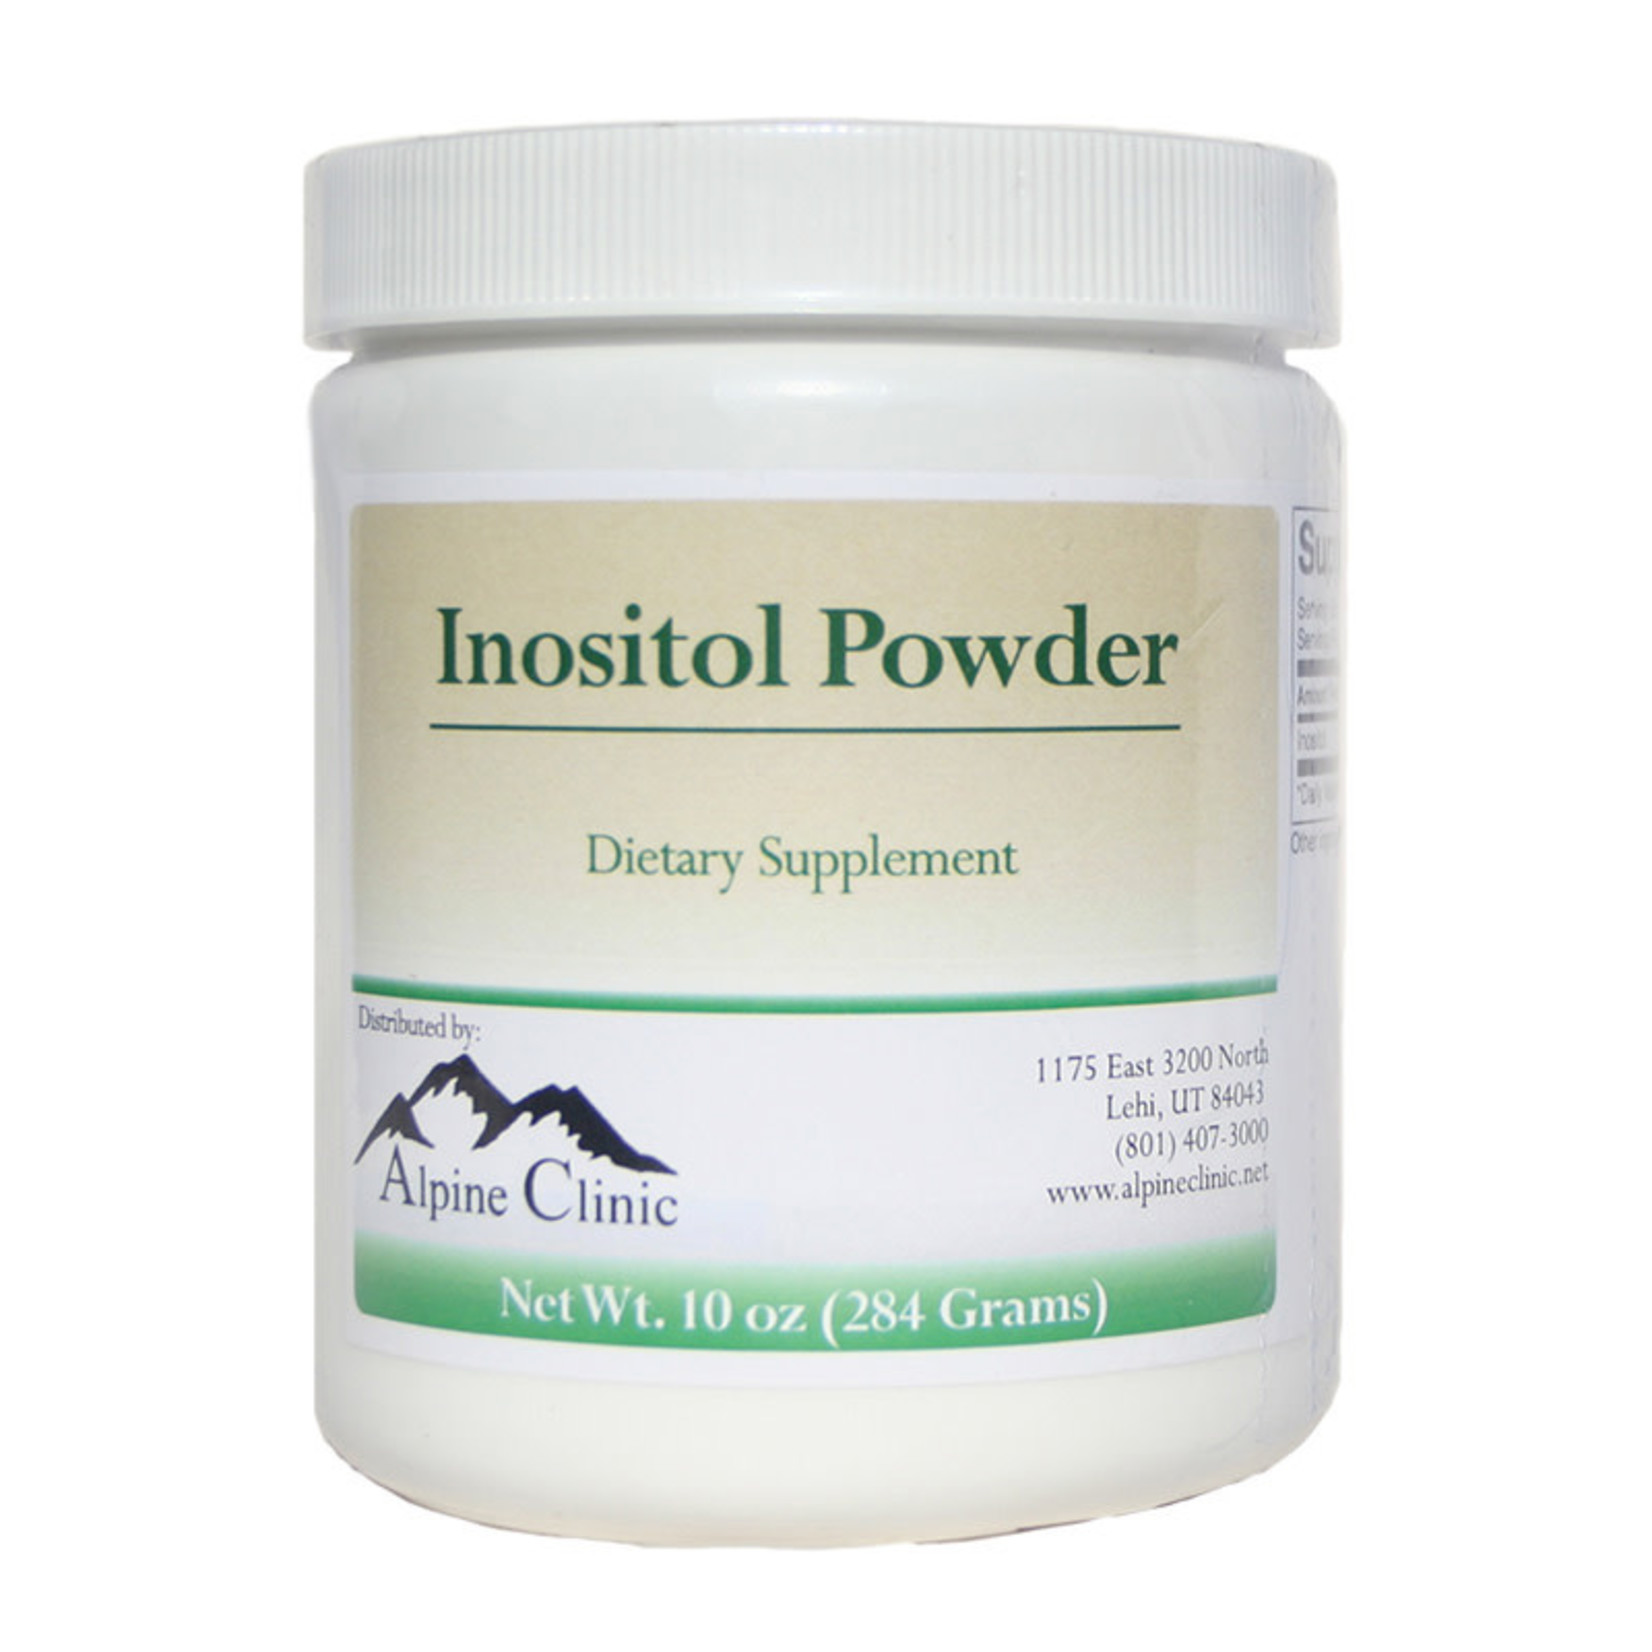 Alpine Clinic PL Inositol Powder